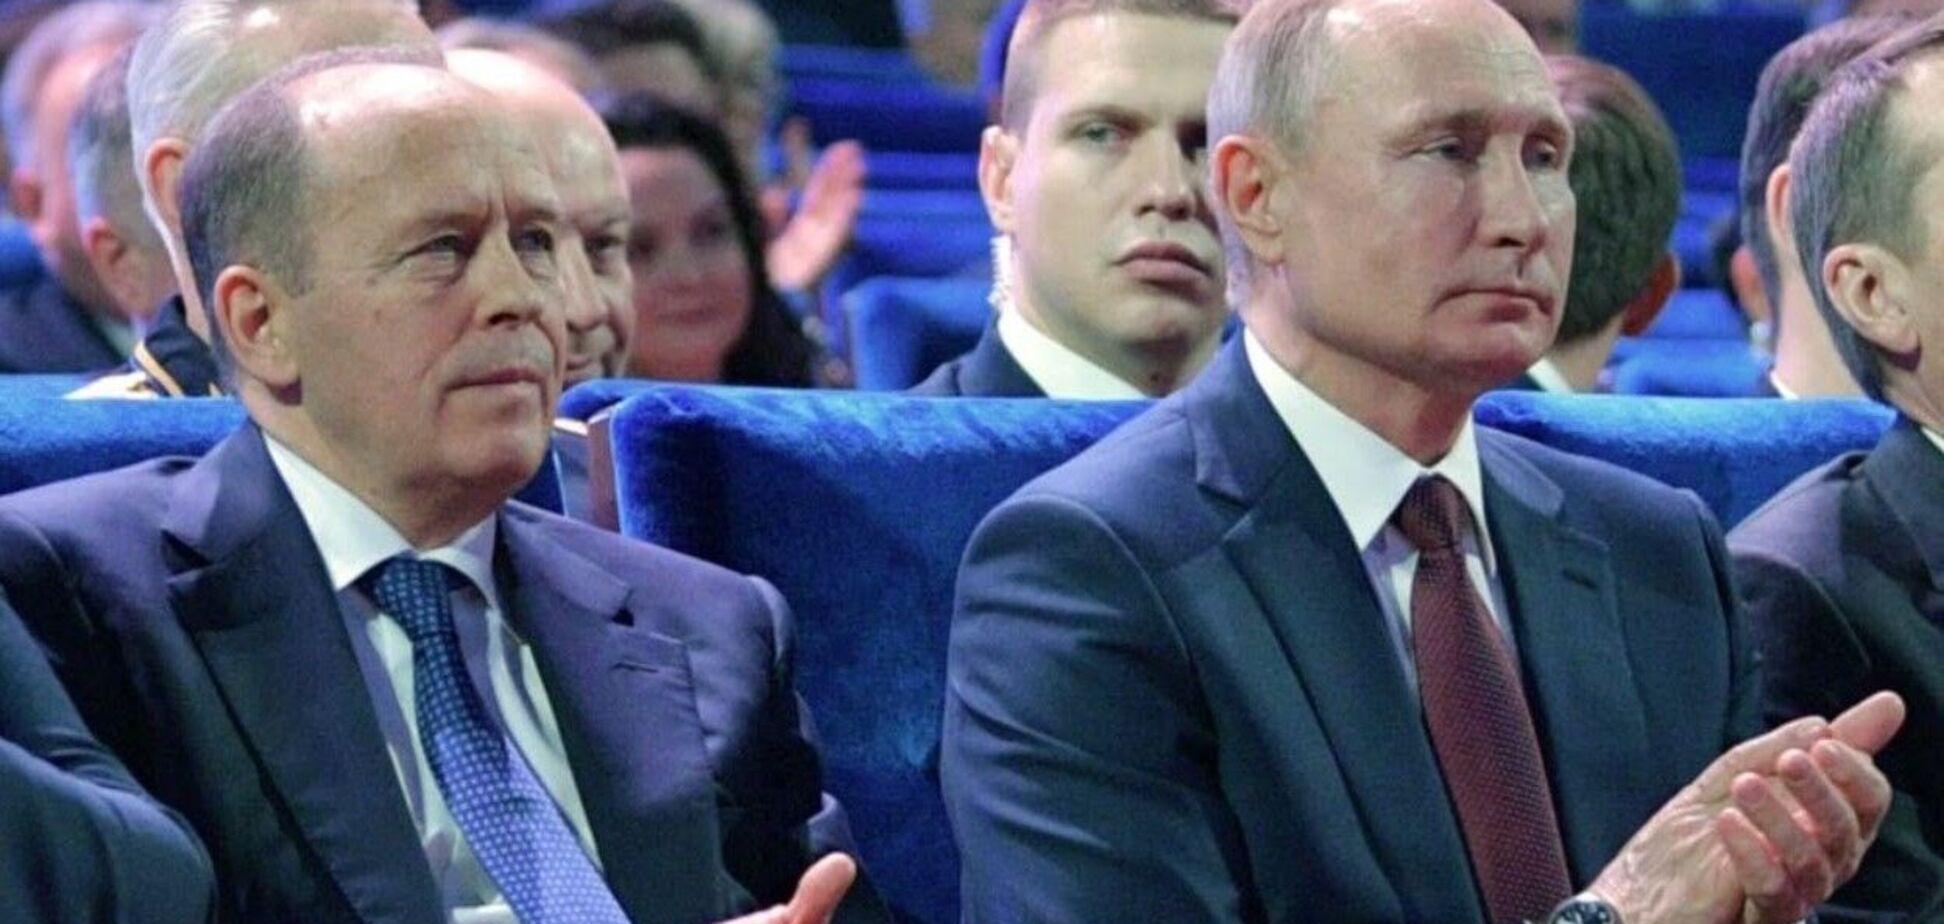 ФСБ/КГБ против Путина. Кто кого?